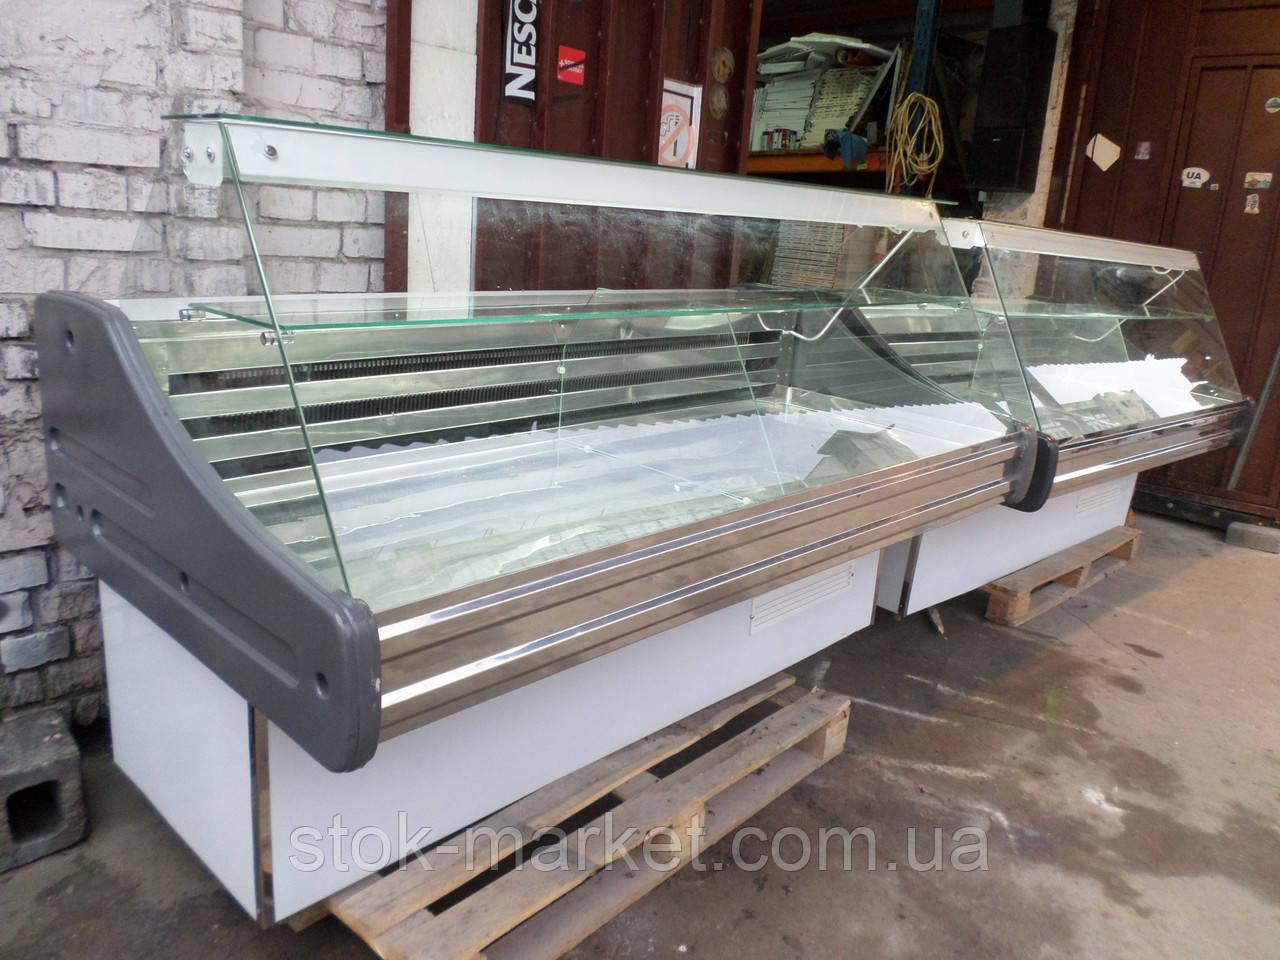 Холодильная витрина Технохолод 1,9 м. б/у, витрина гастрономическая холодильная б у, прилавок холодильный б у.